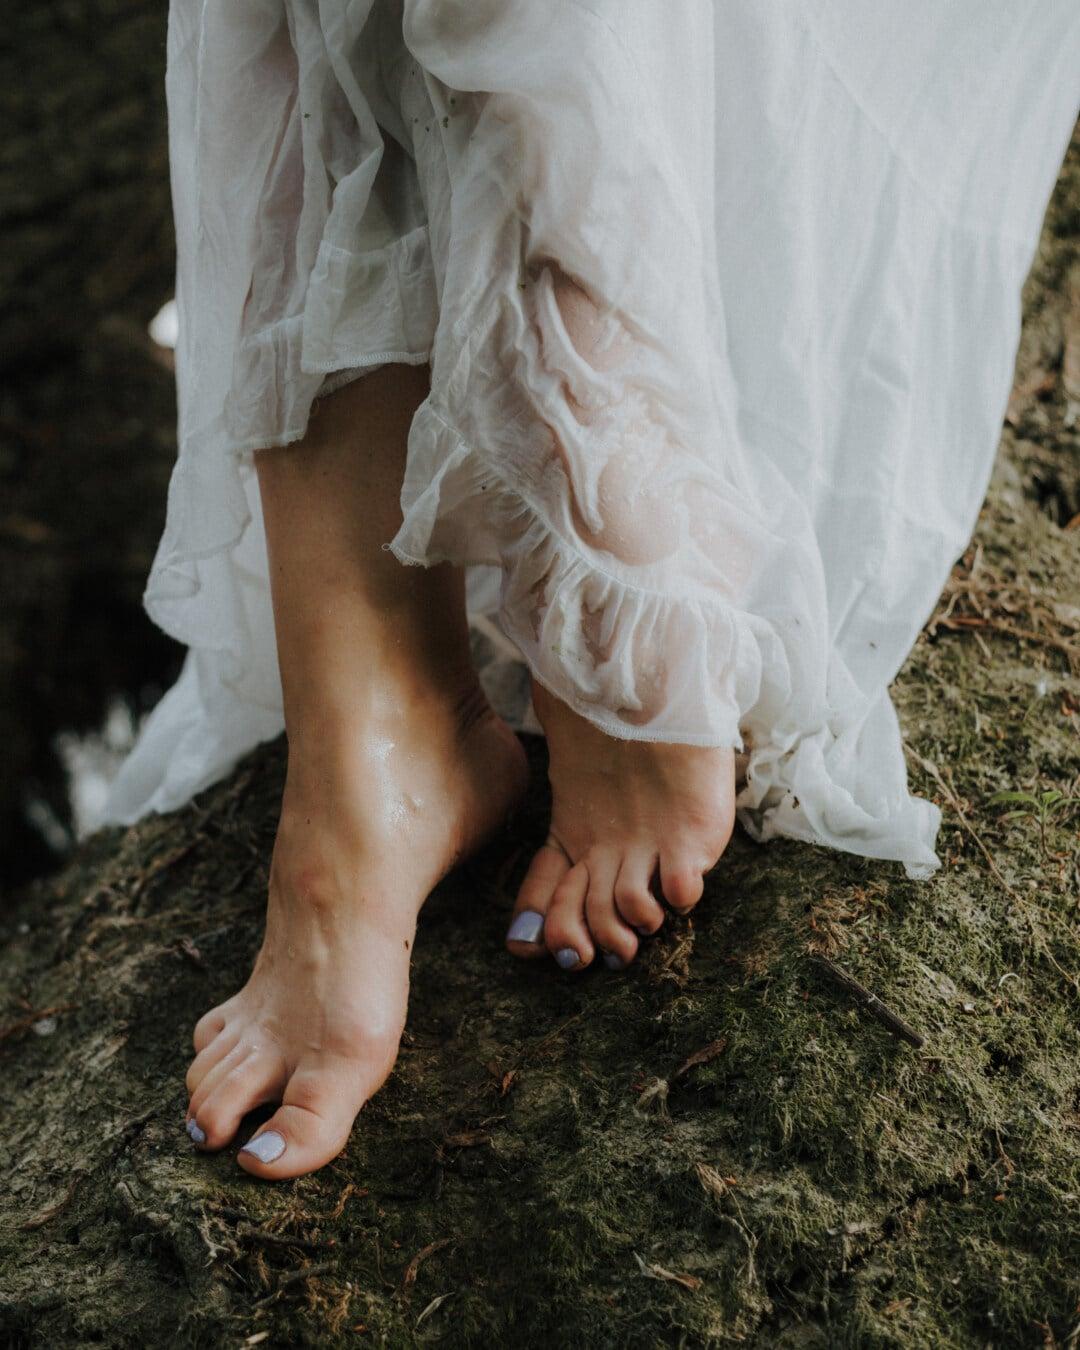 jambes, pieds nus, vernis à ongle, doigt, robe de mariée, la mariée, mariage, jeune fille, femme, mode